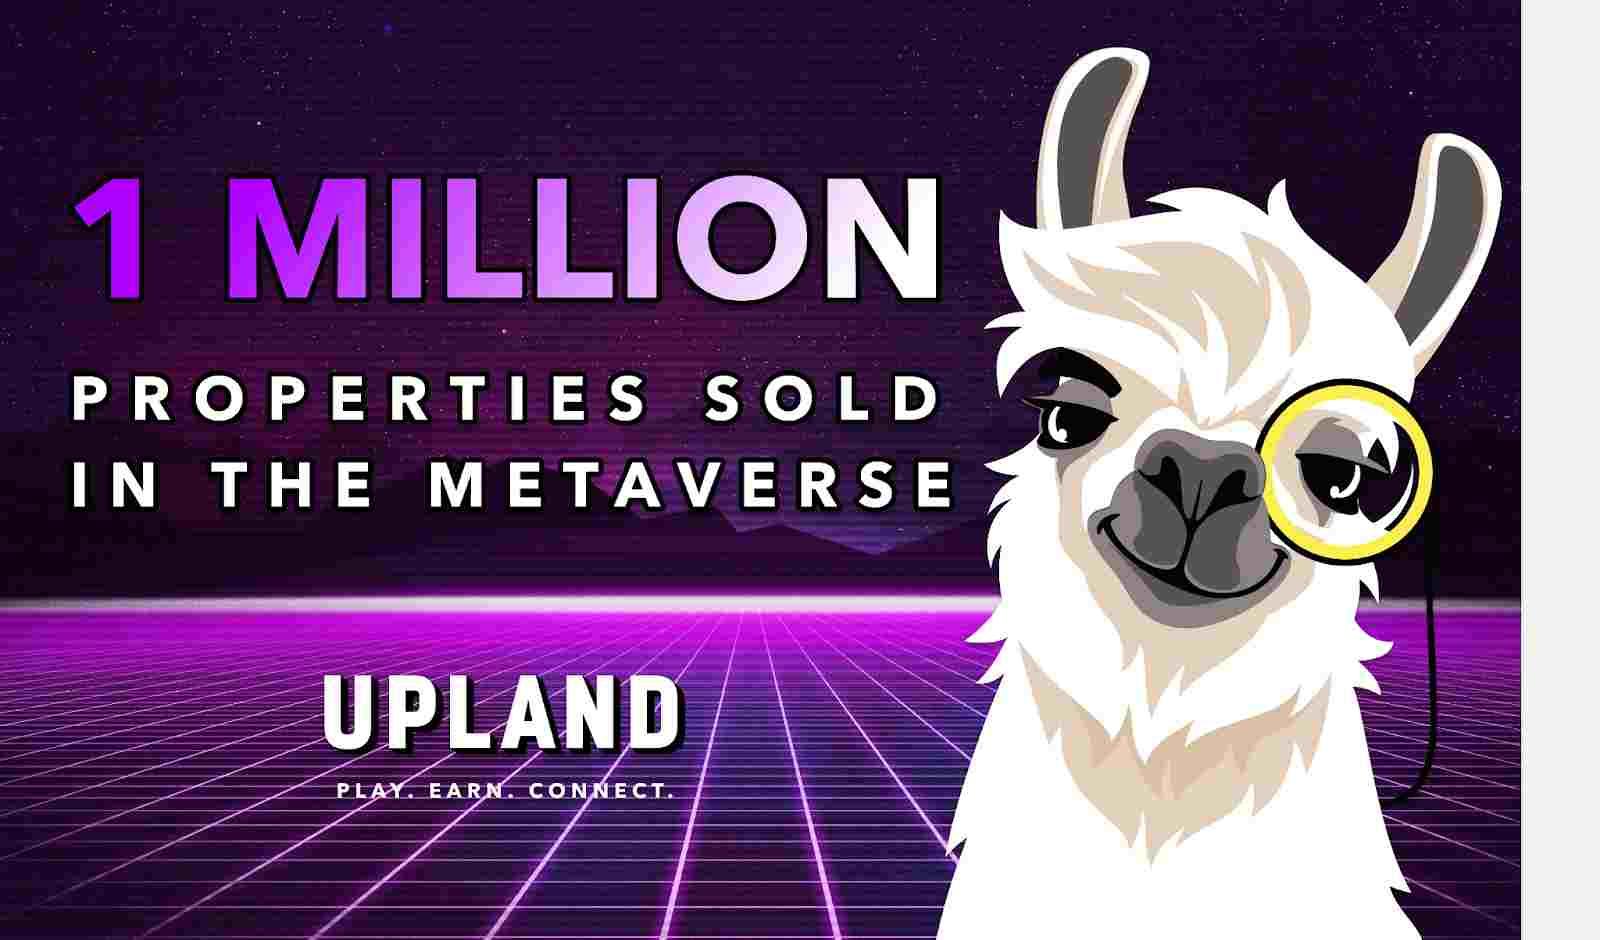 Upland NFT Metaverse